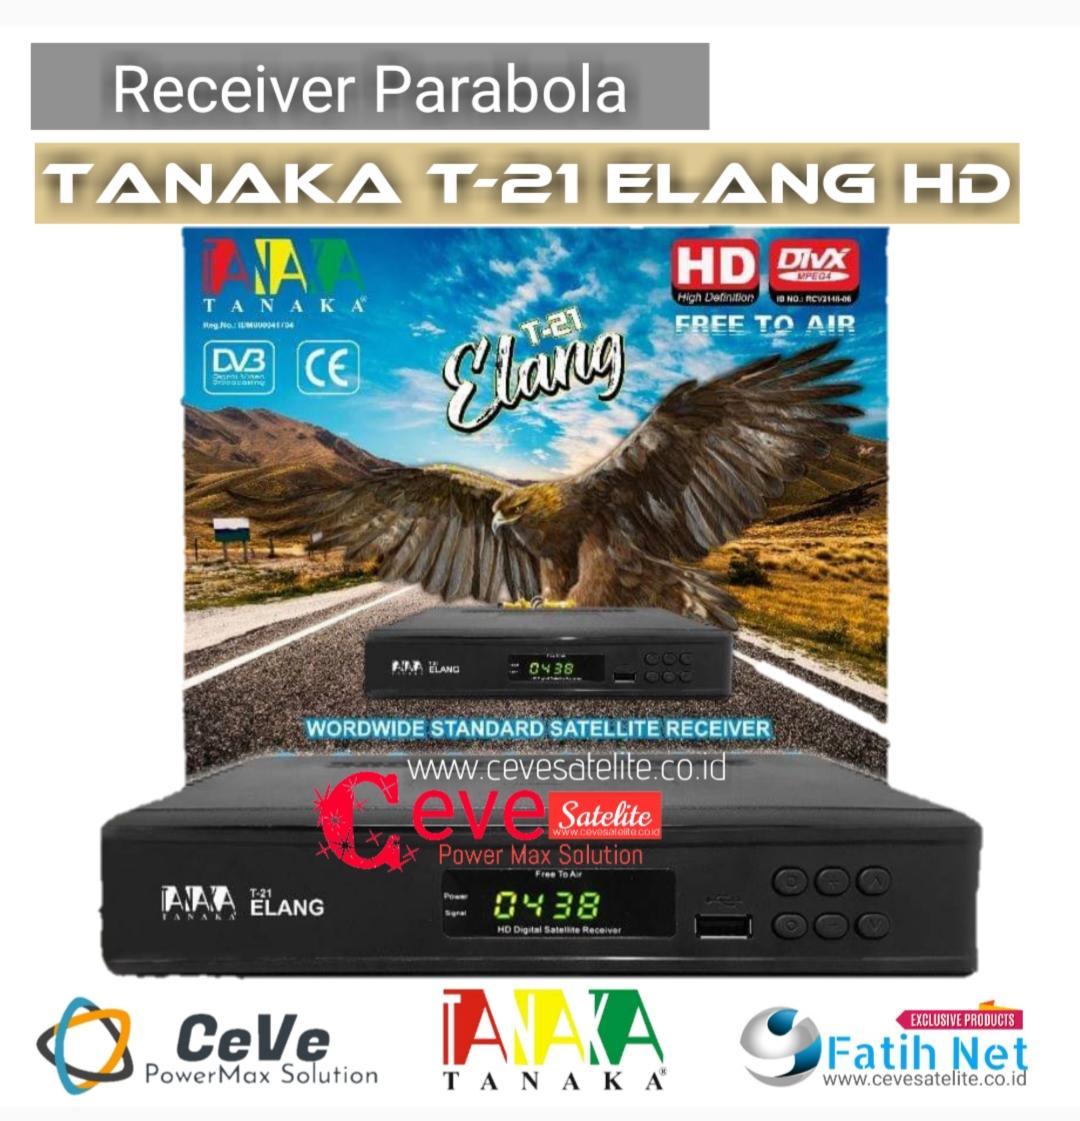 Receiver Parabola T21 Tanaka T-21 Elang By Fatih Net.